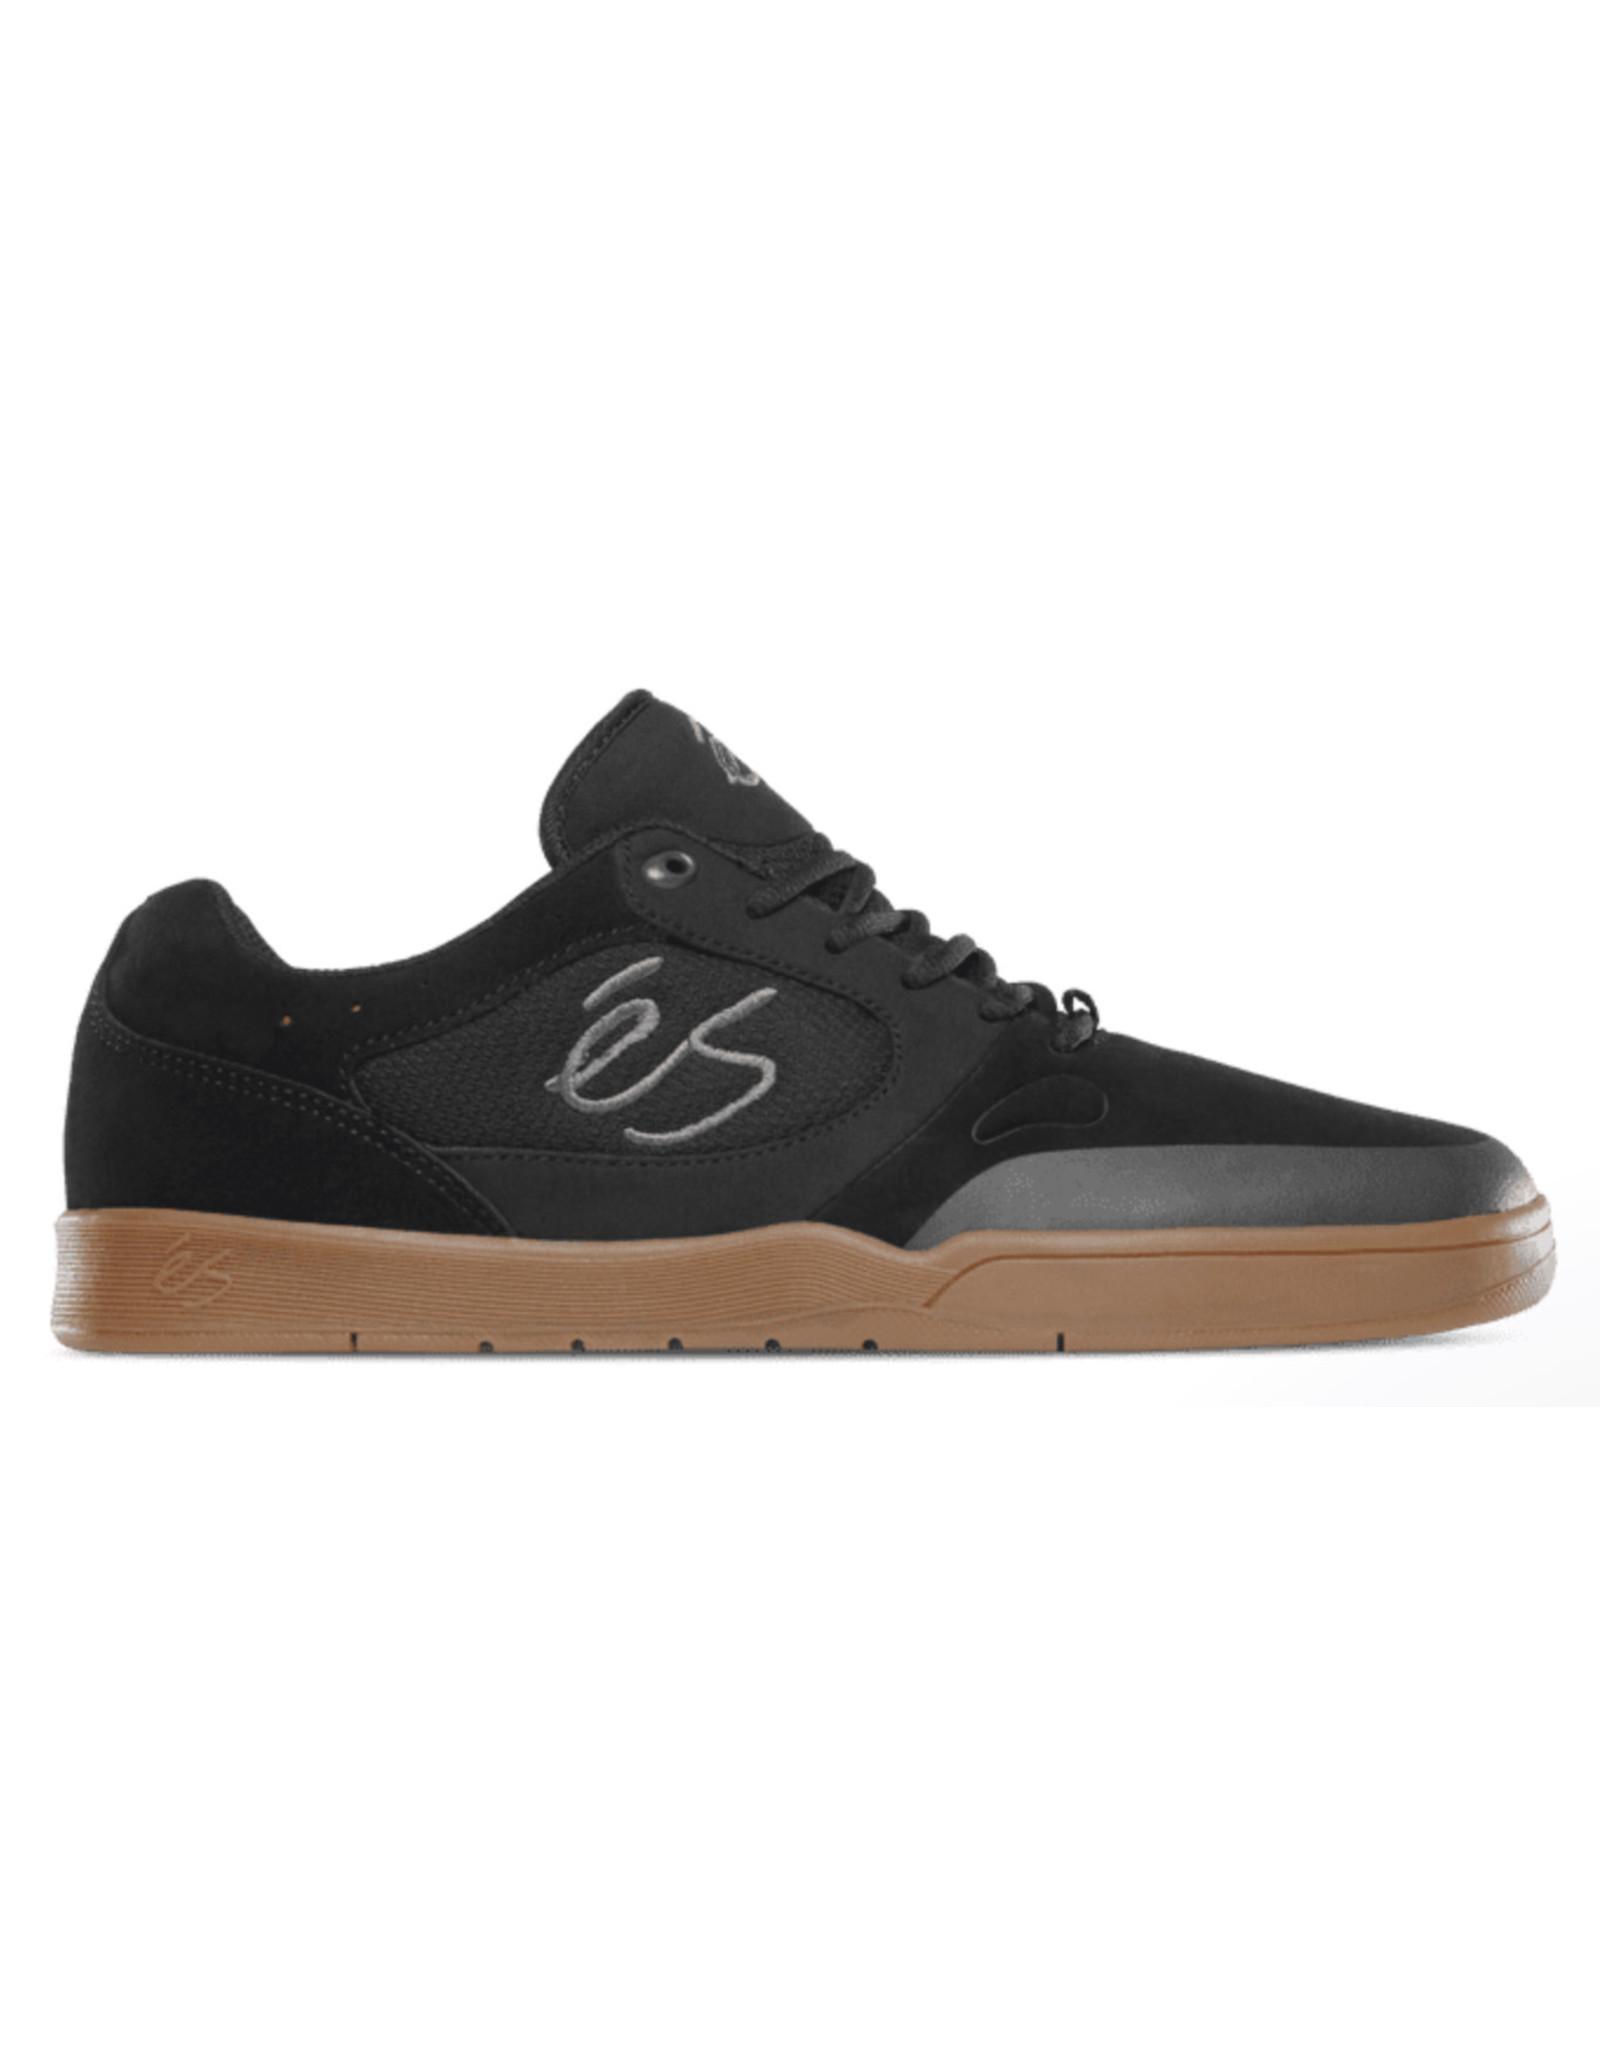 es footwear Swift 1.5